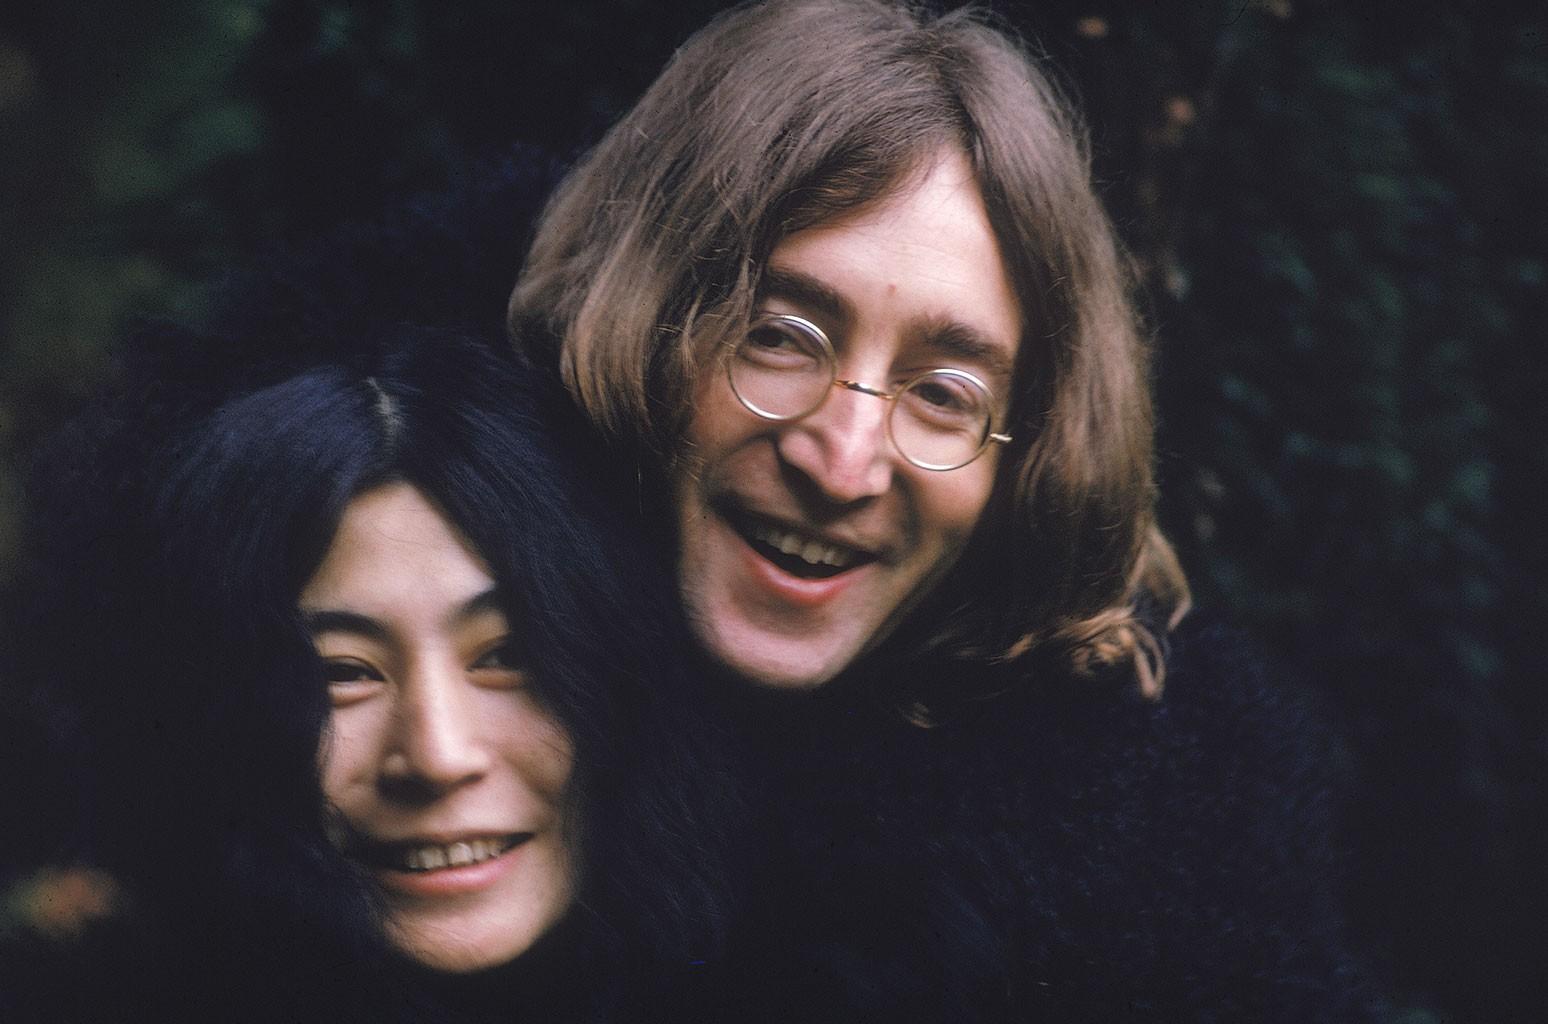 John Lennon & Yoko Ono: Song-by-Song Relationship Timeline